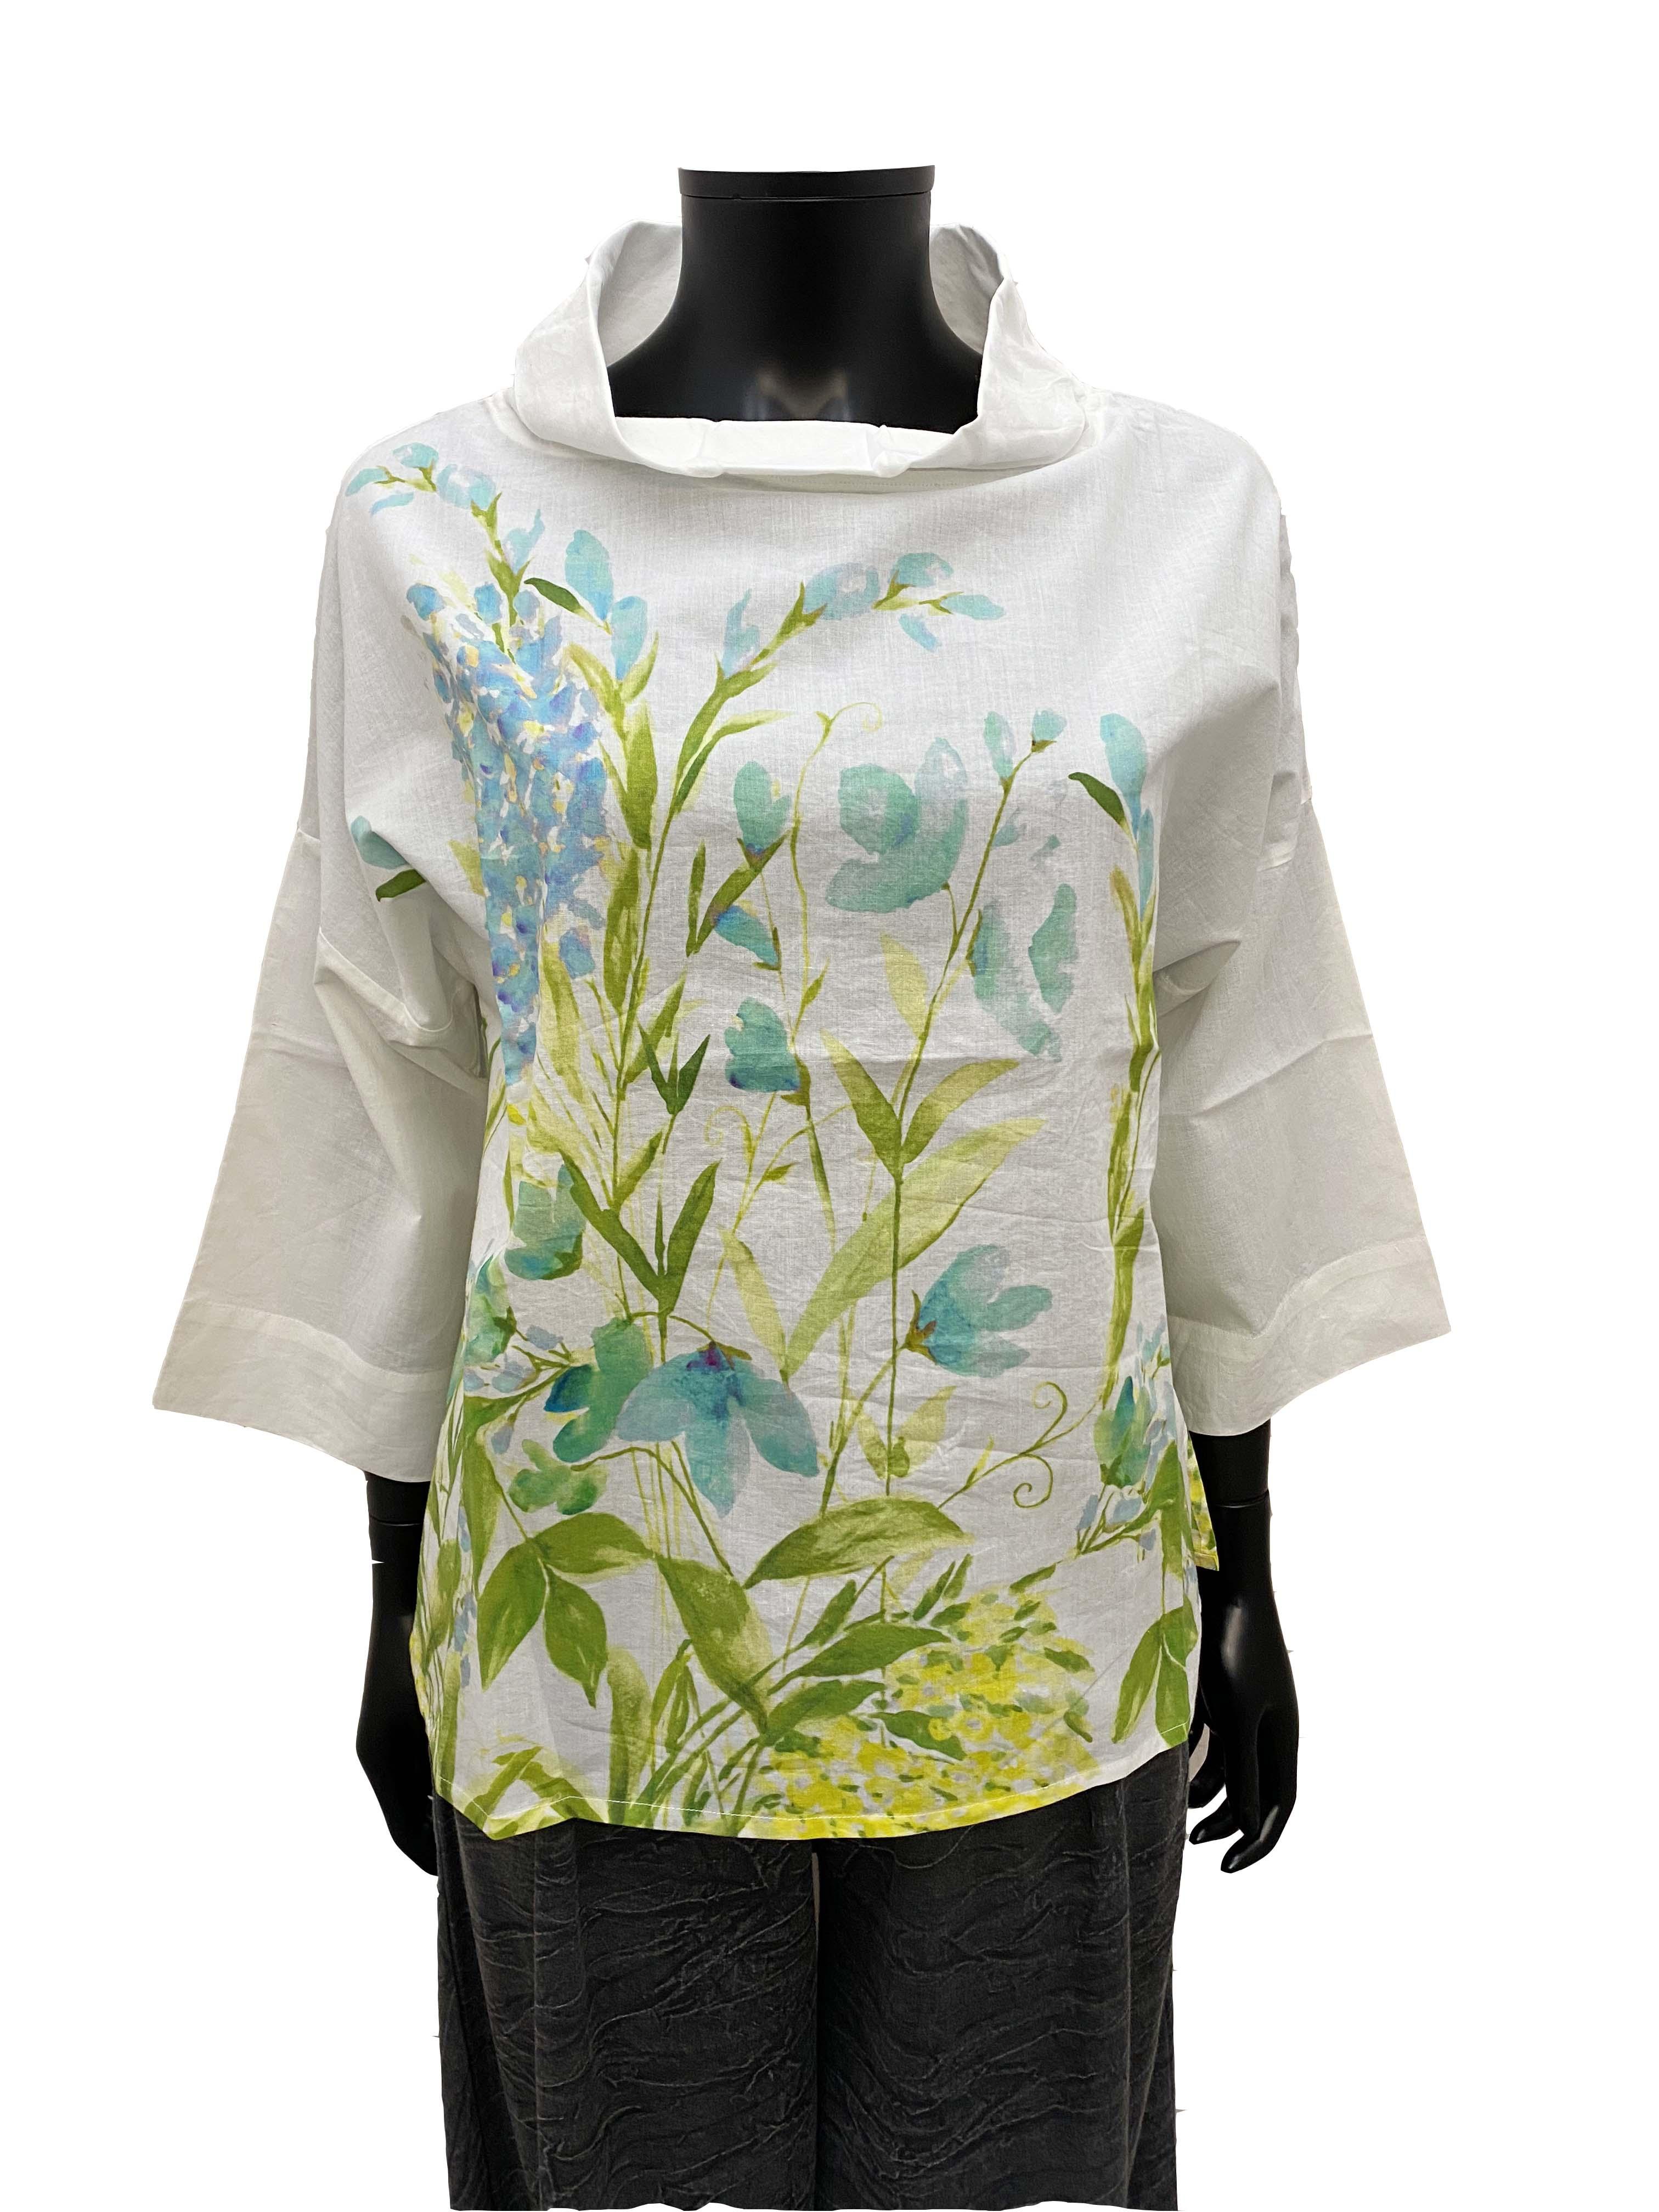 blouse_008